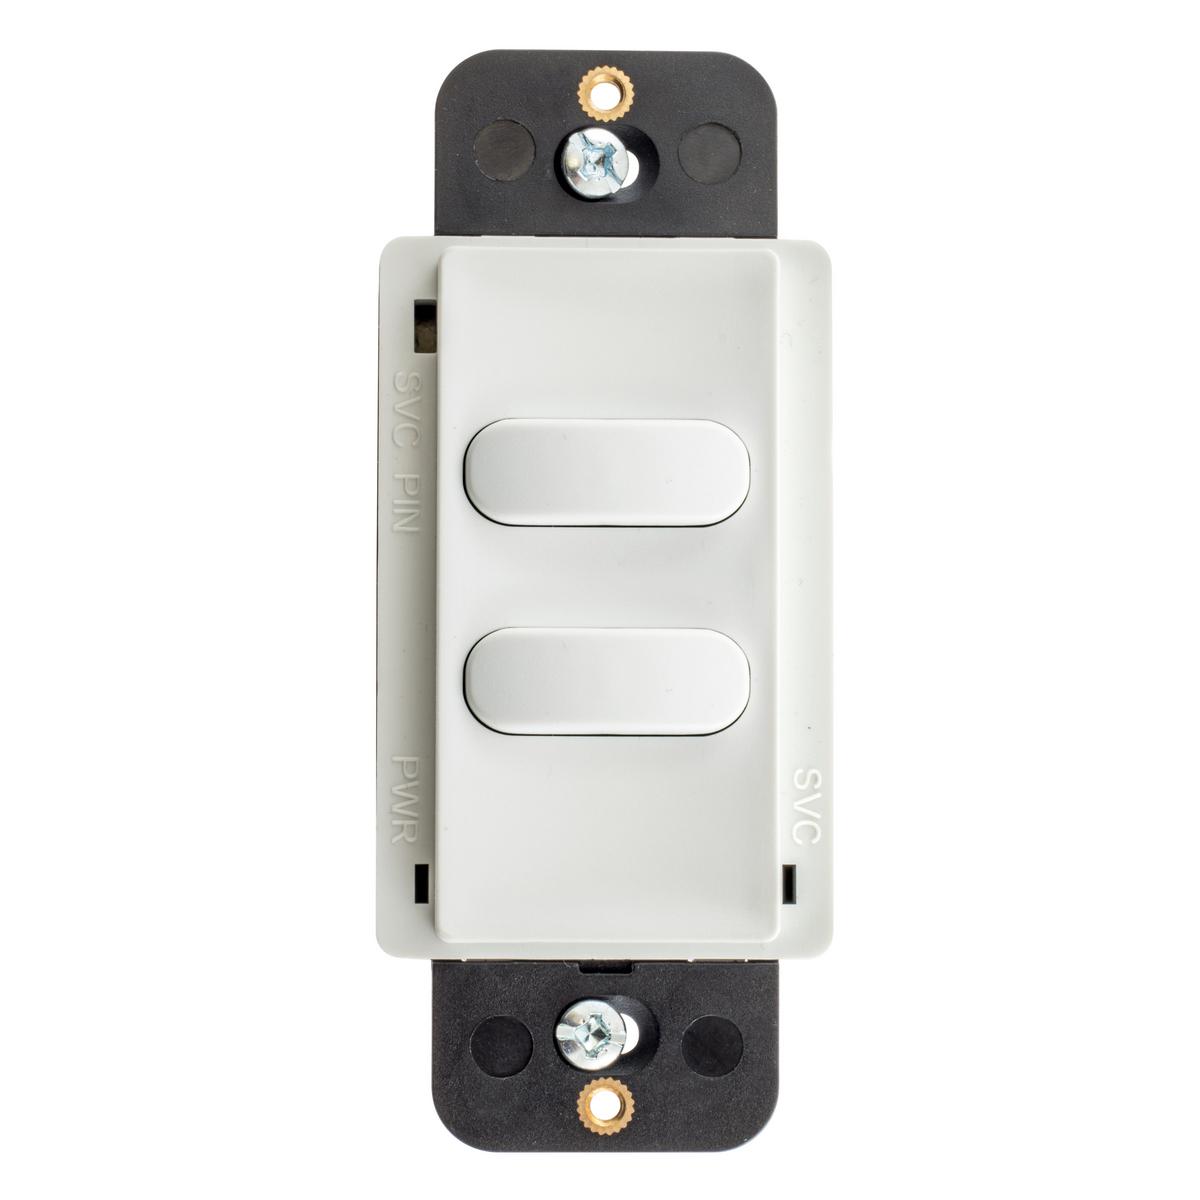 Dsm30w2 Brand Wiring Device Kellems